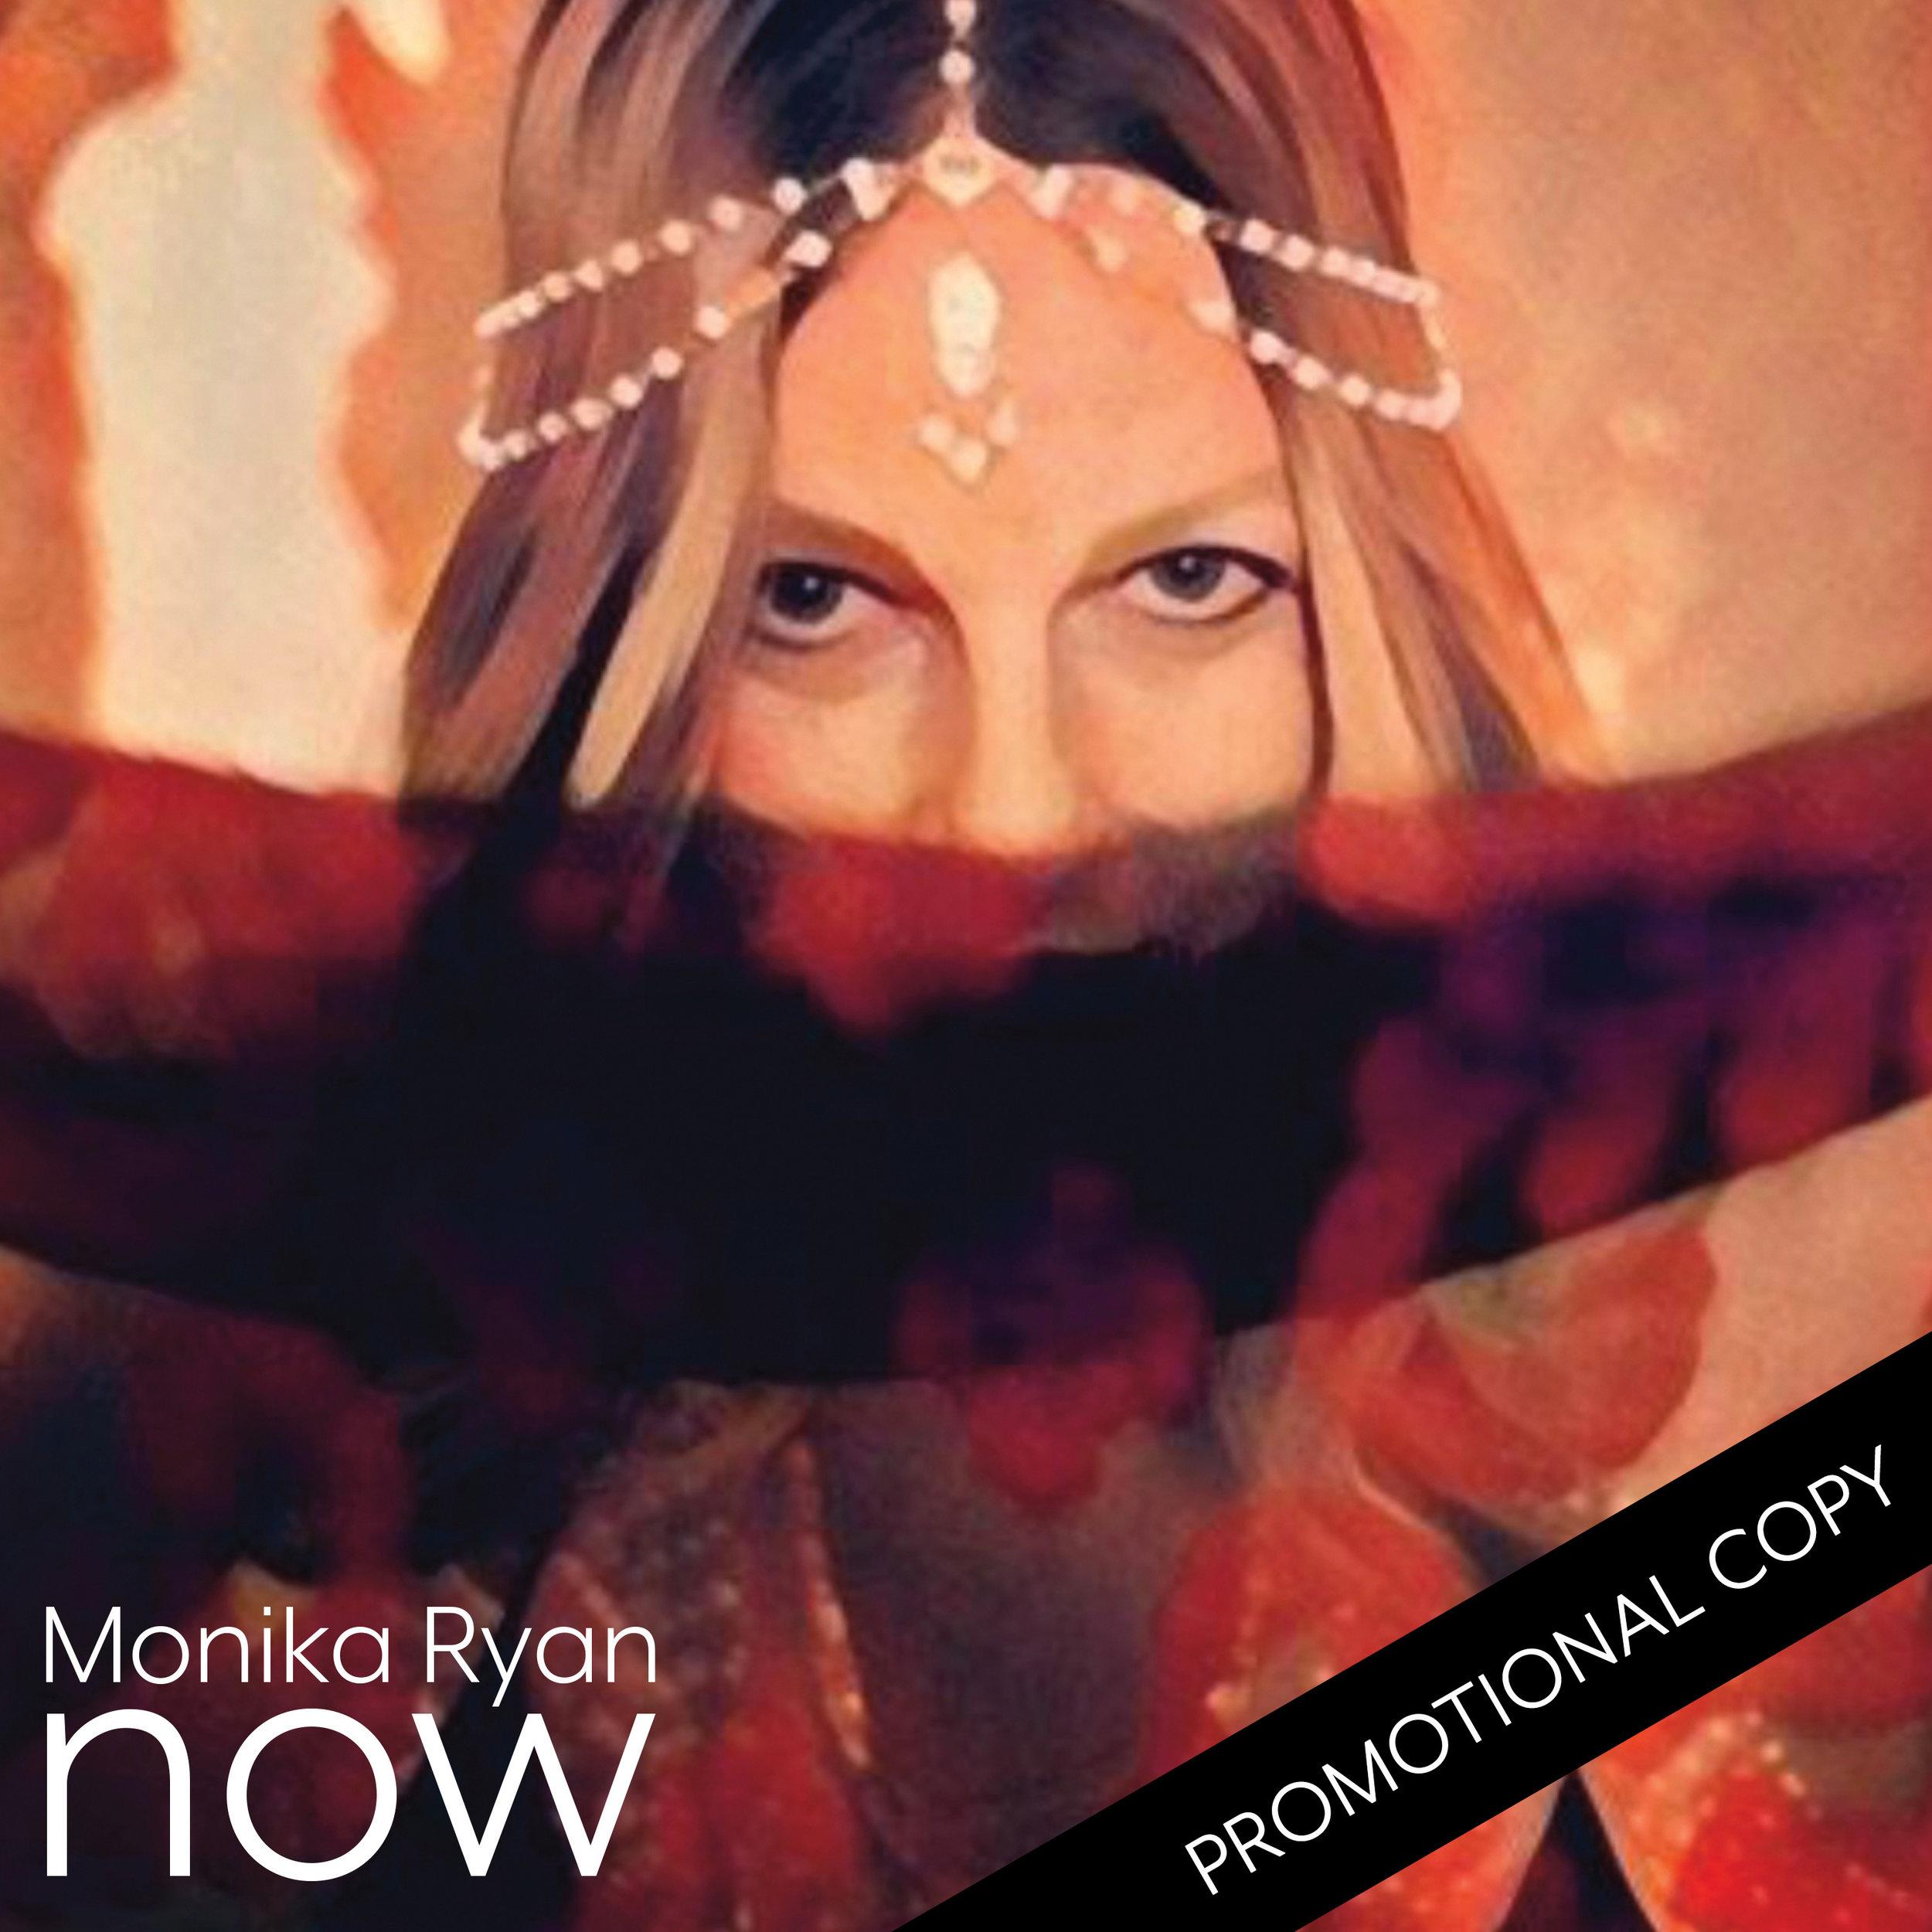 Monika-Ryan-CDArt-3000-Promo.jpg